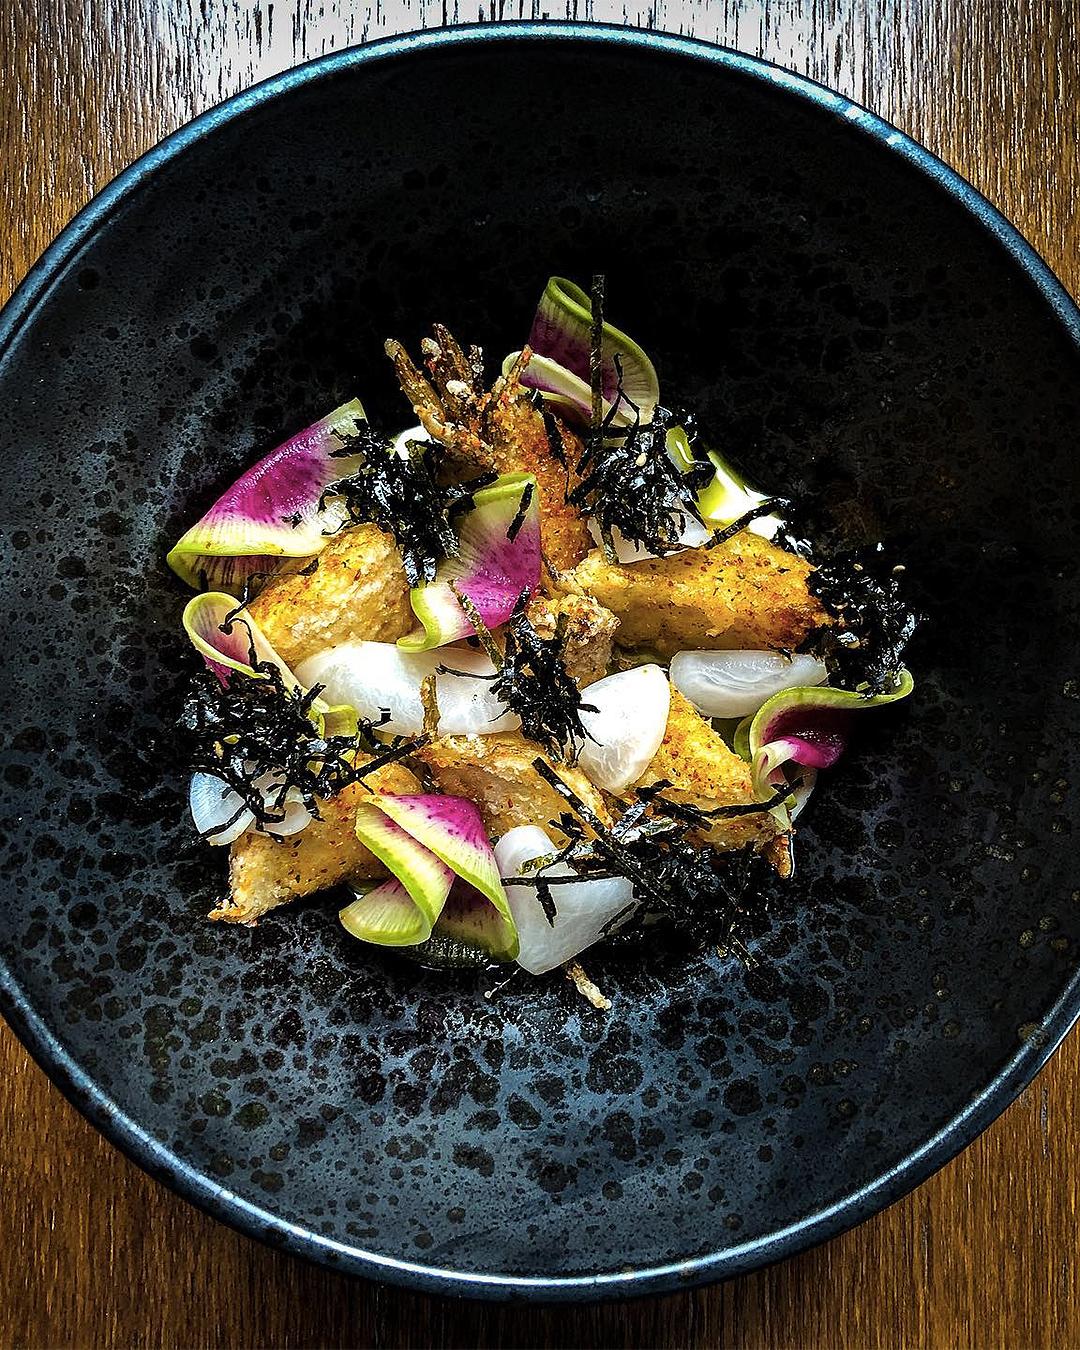 karaage turnip, creme fraiche, sorrel, shichimi, seaweed is served up at Moiety.